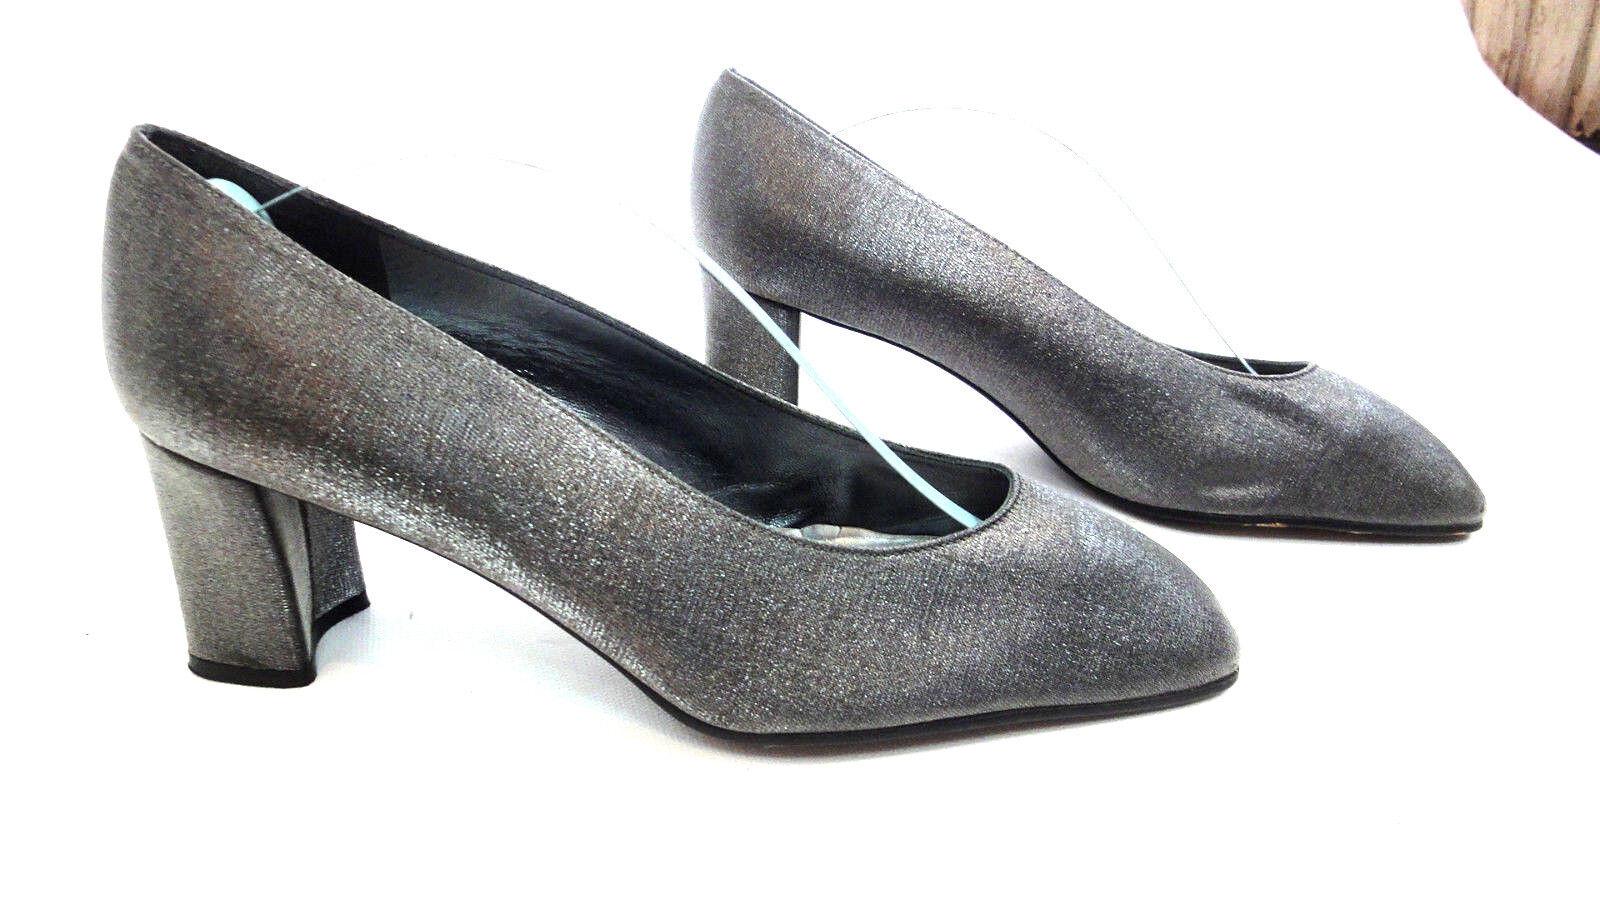 STUART WEITZMAN Vintage Elegant Silver Silk Pumps Heels Classic  s 8 Medium